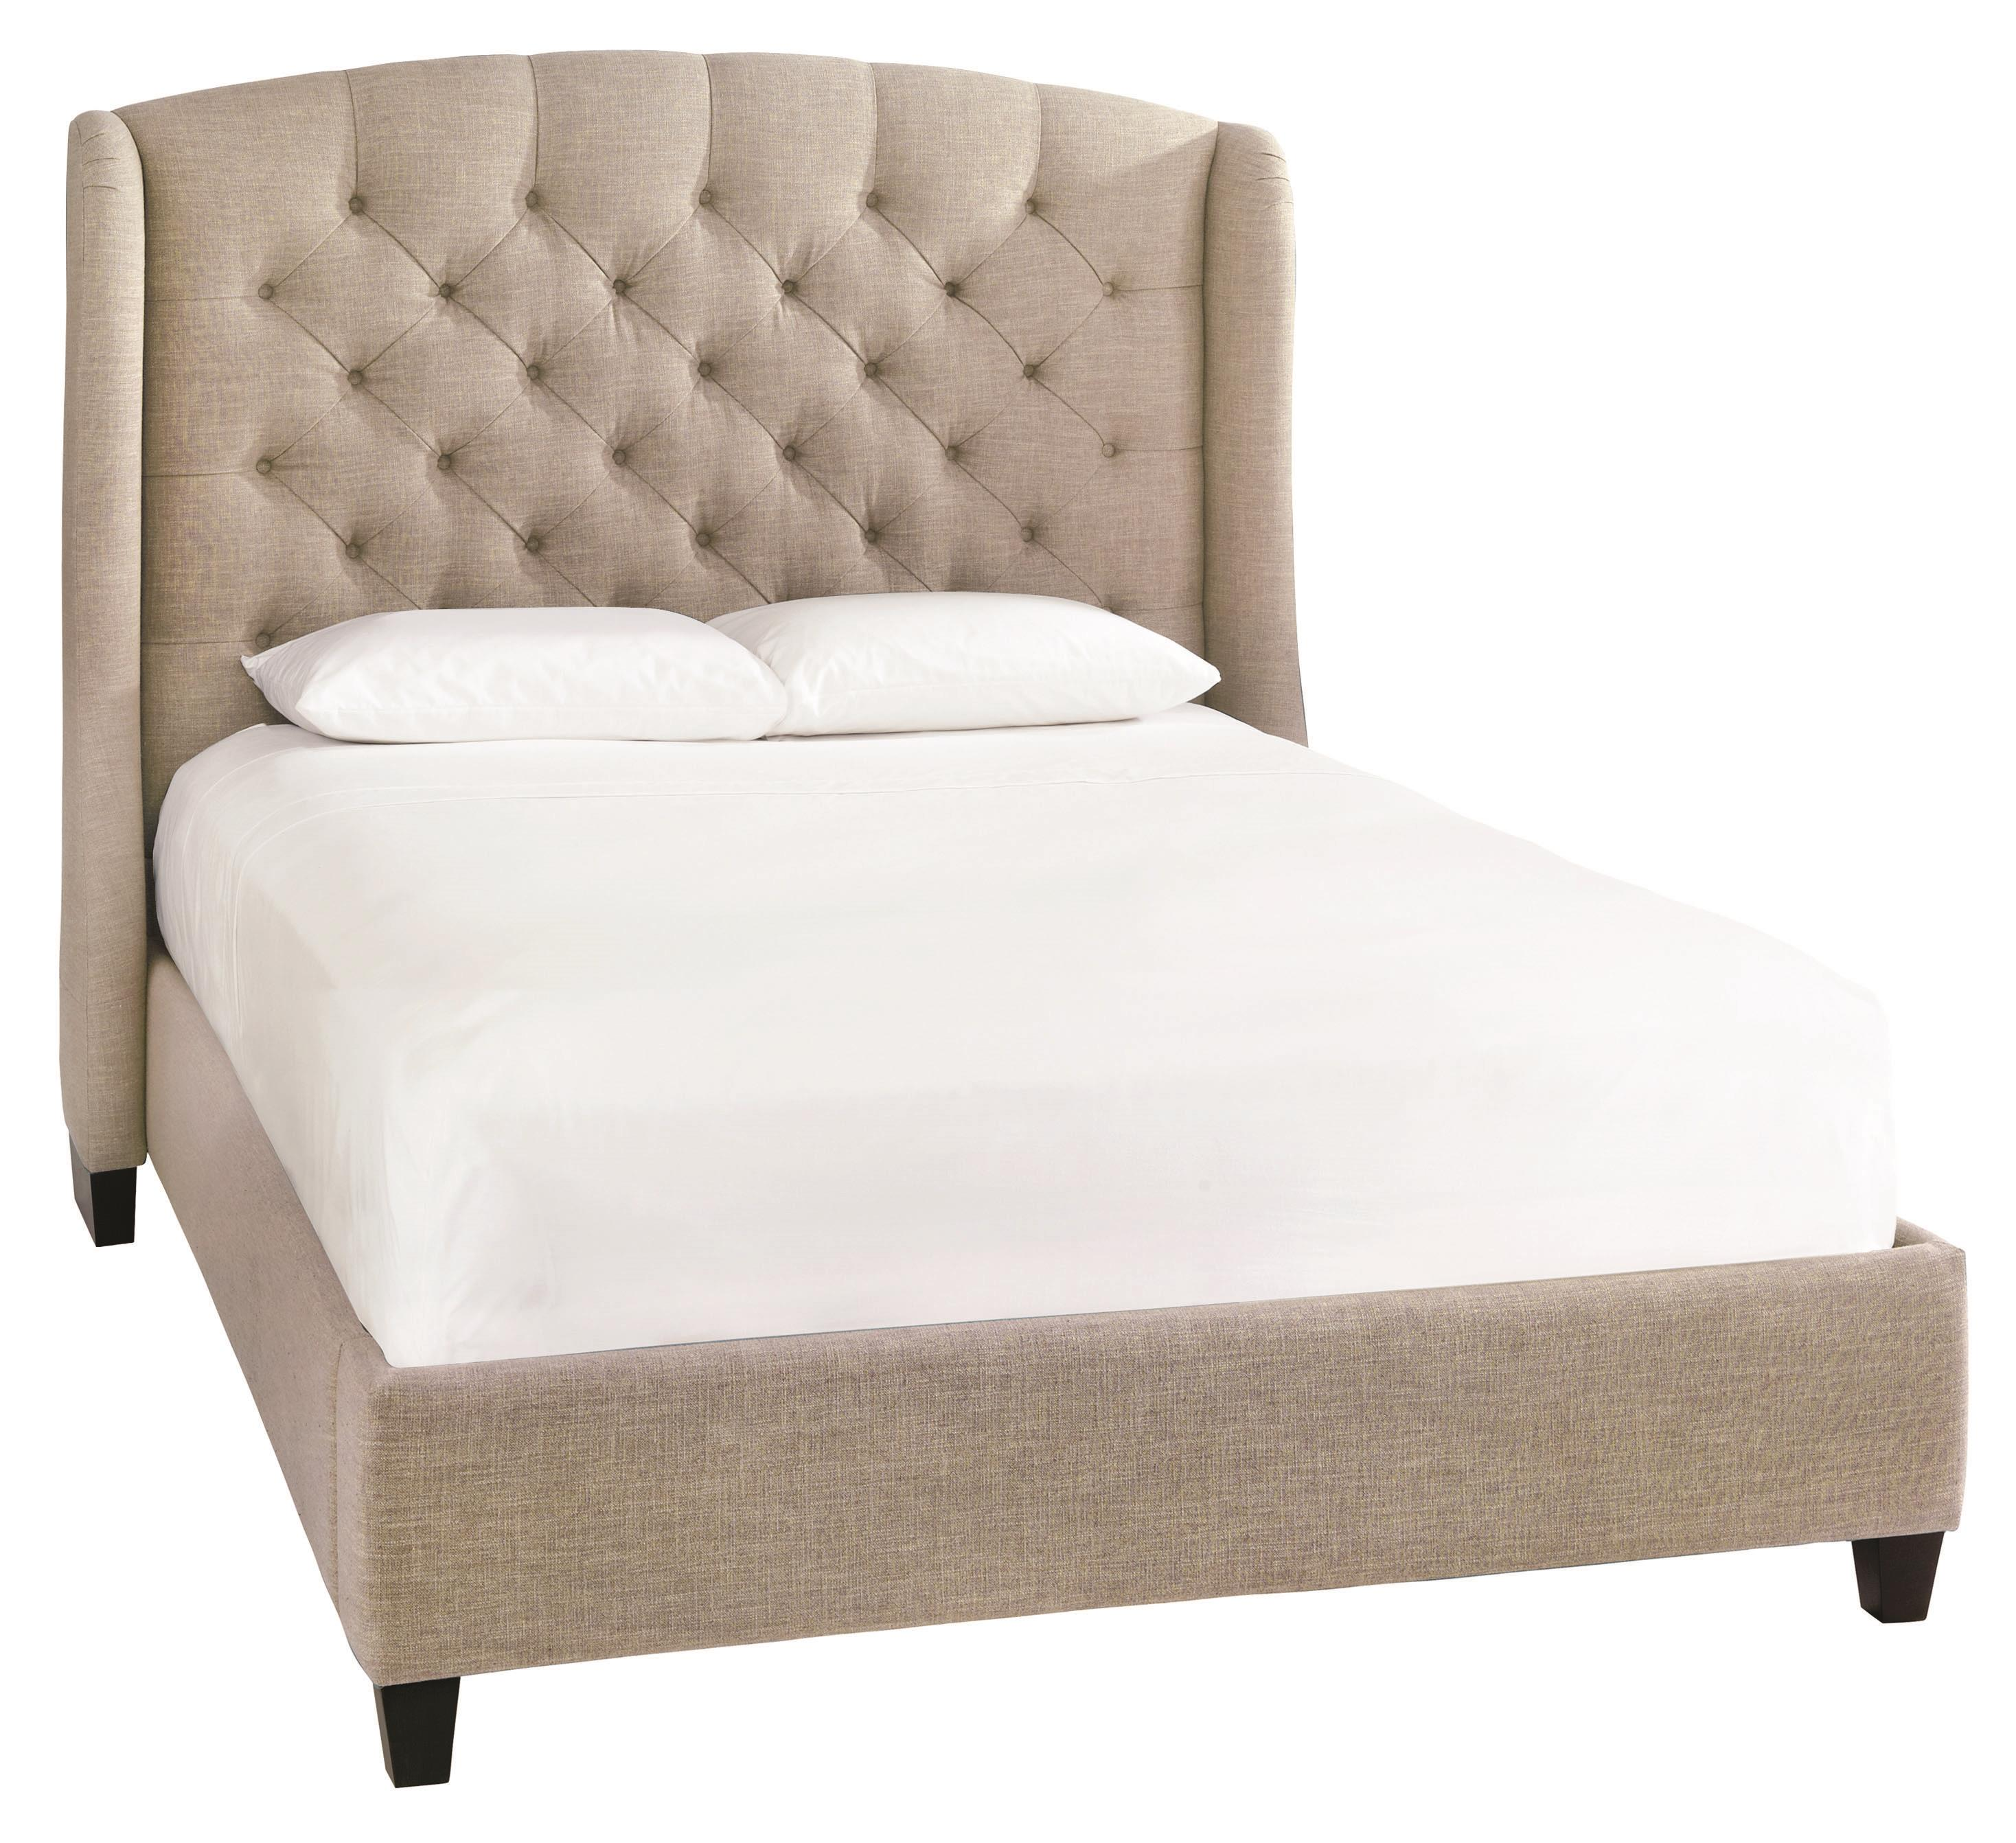 Paris King Size Upholstered Bed